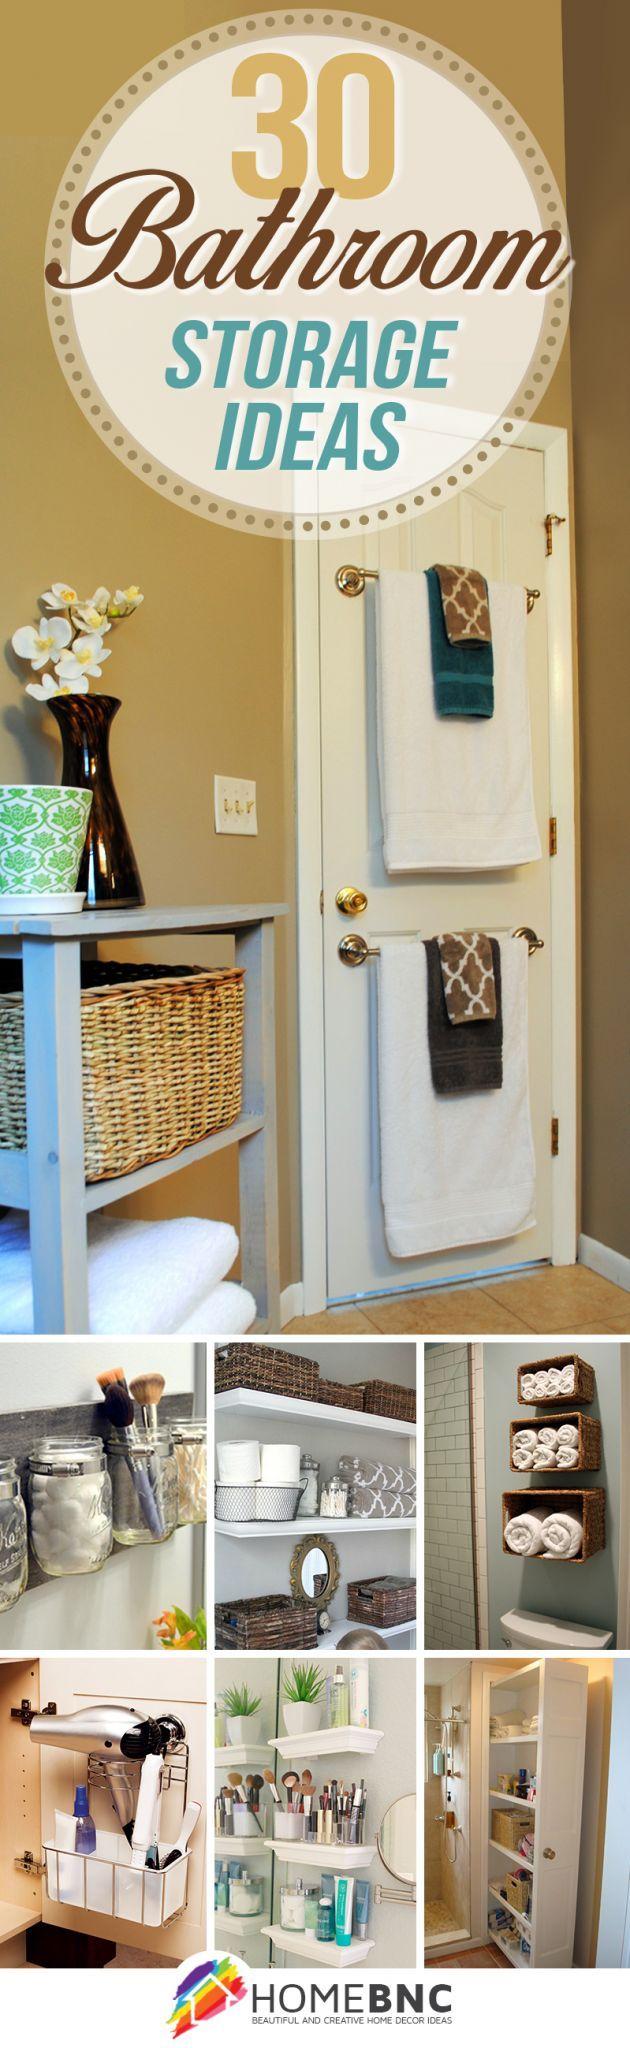 Bathroom Storage Design Ideas 30 Best Bathroom